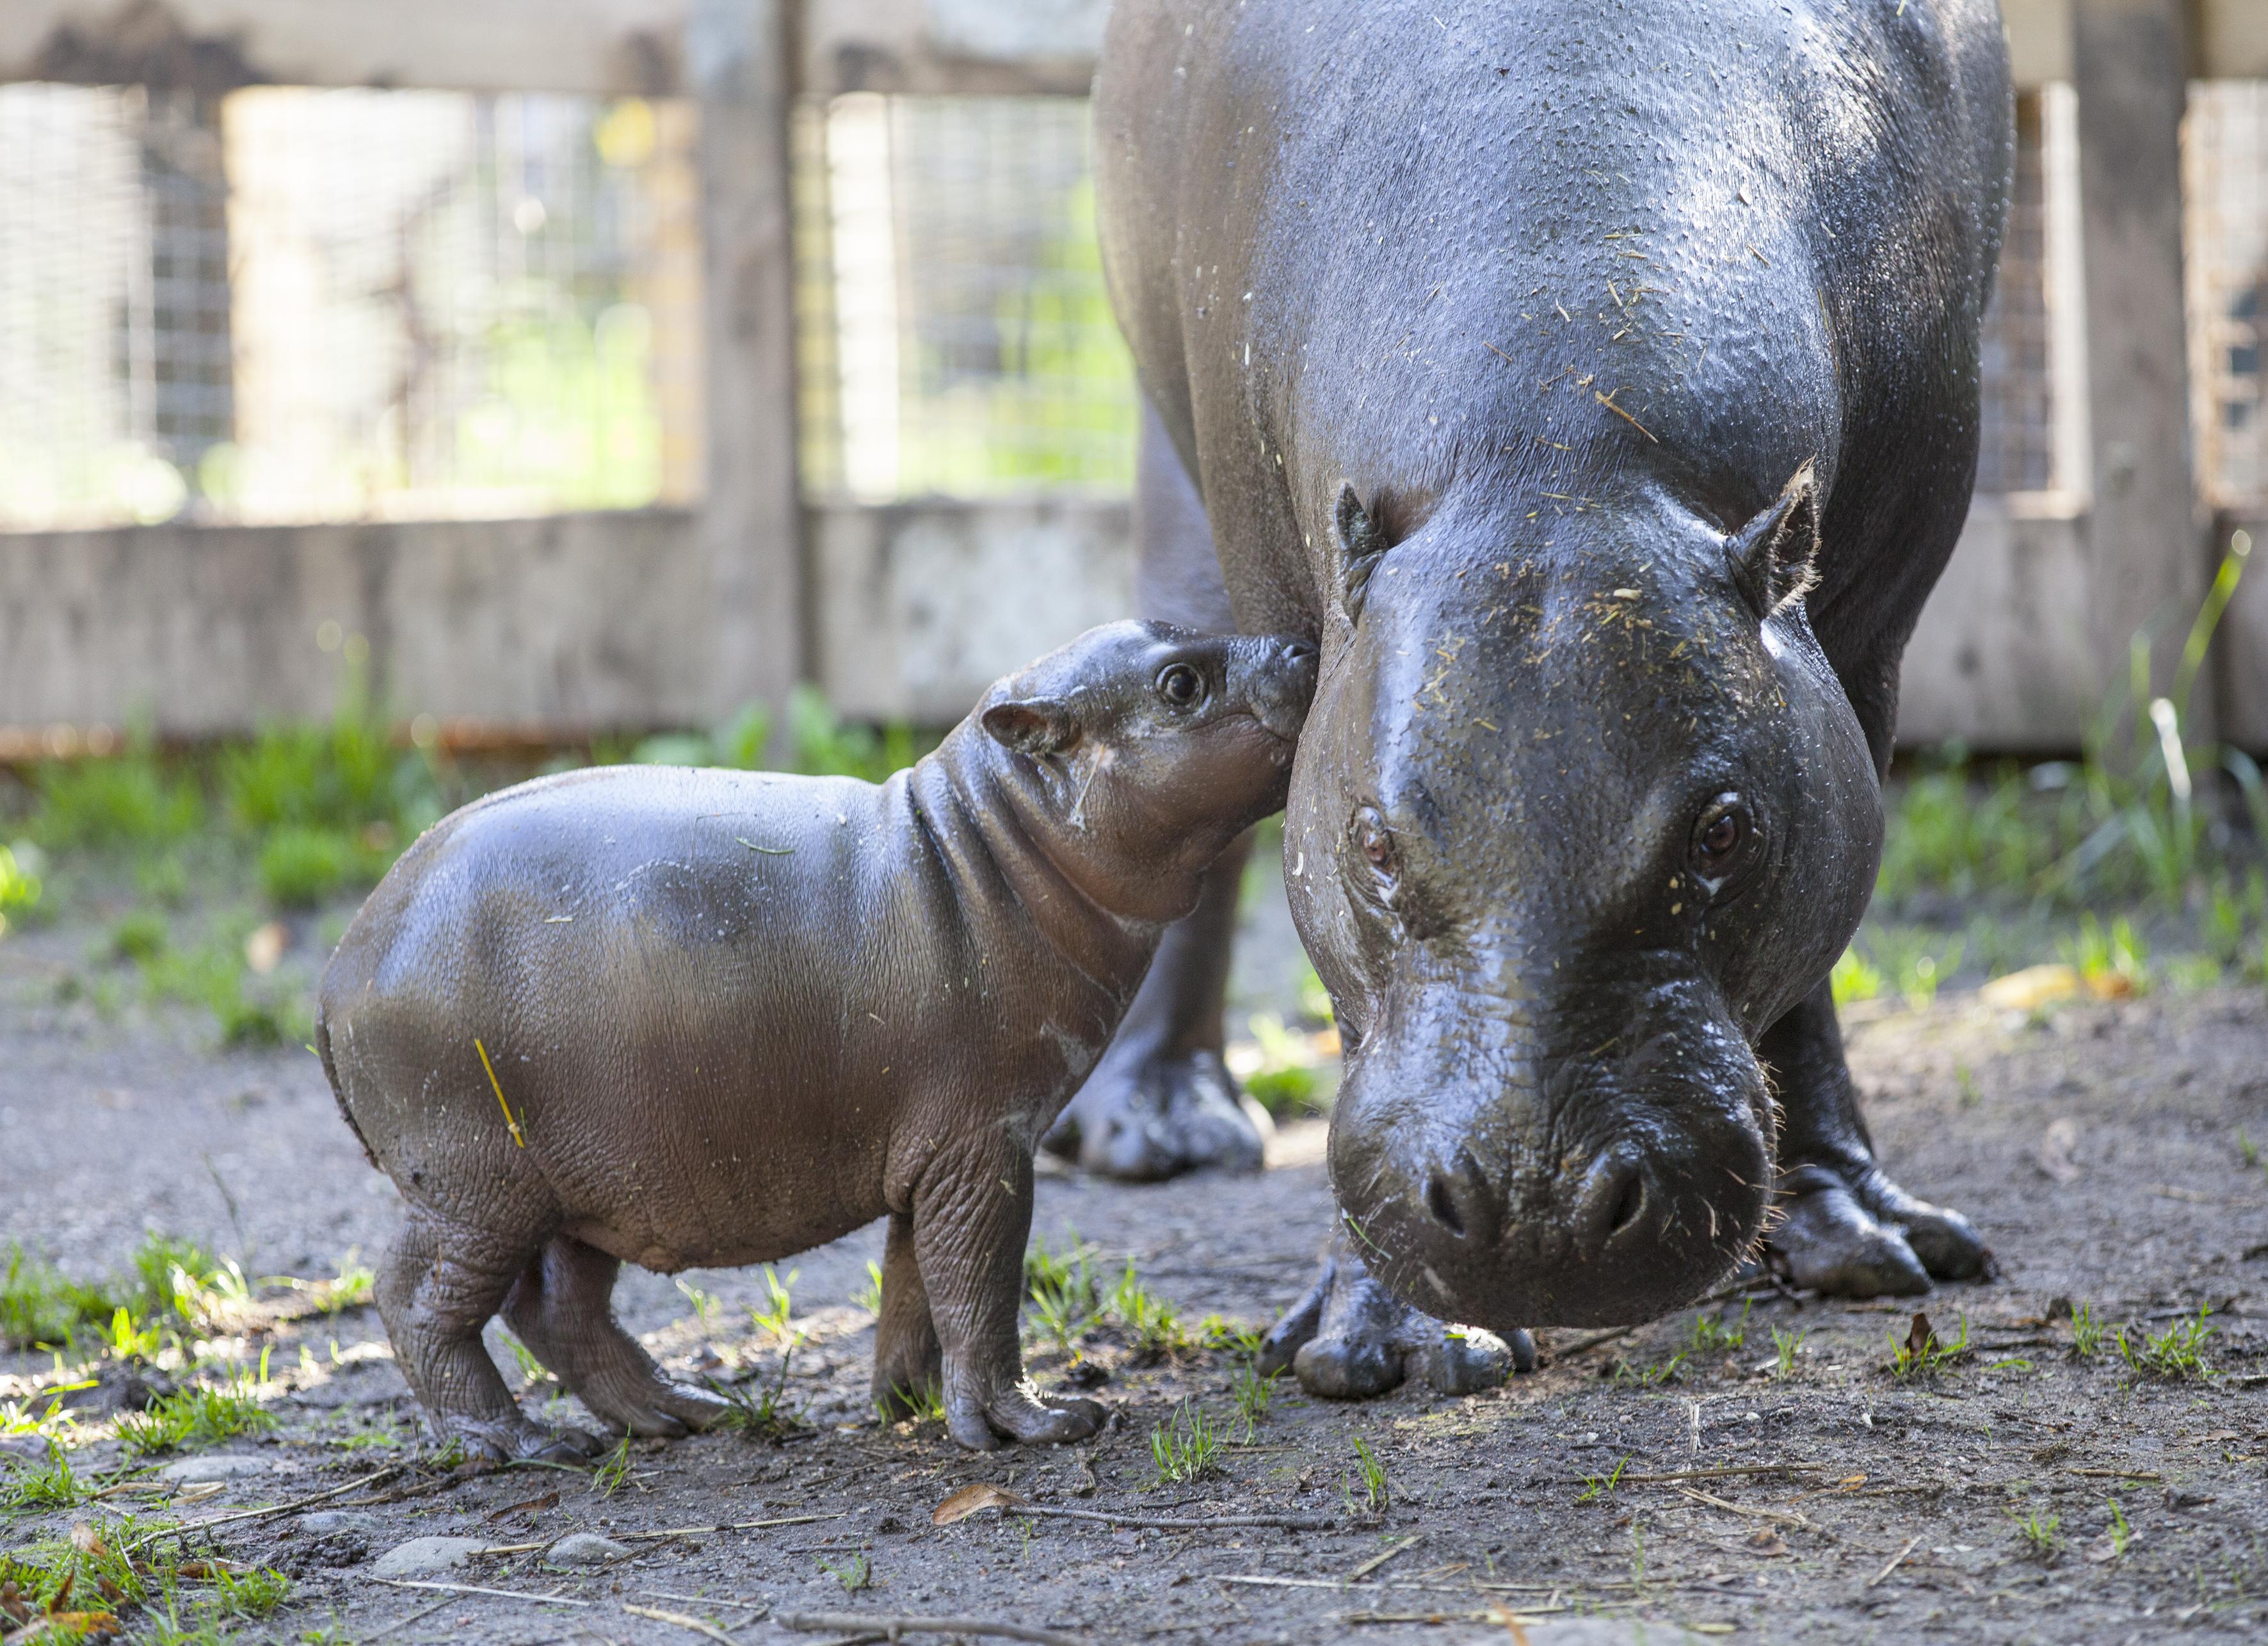 Cute baby Dwarf Hippo arrives at Parken Zoo in Sweden